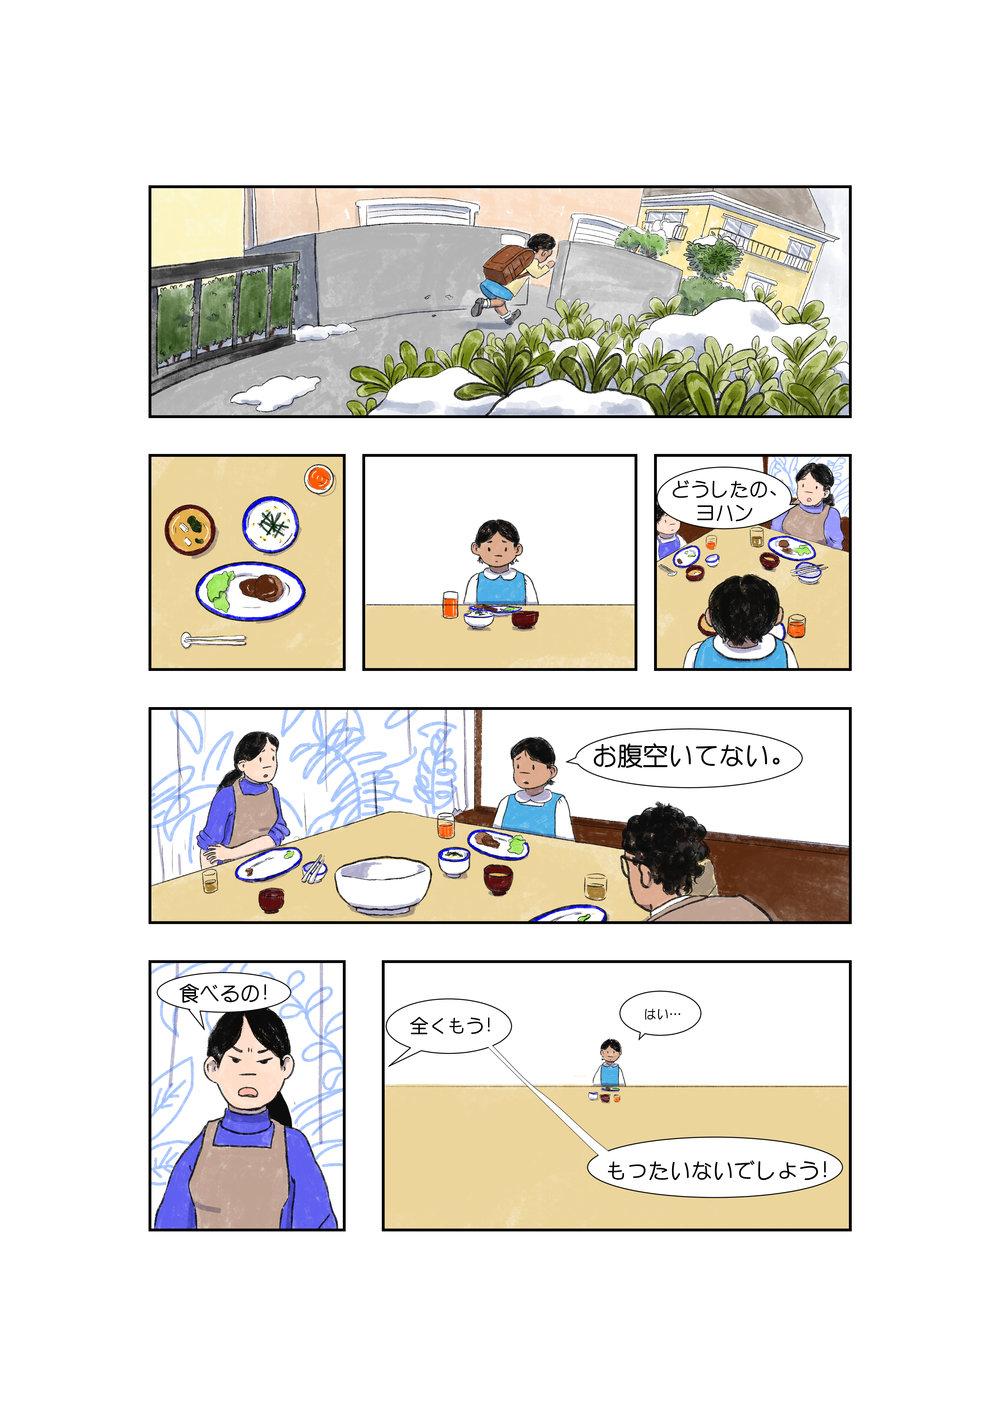 yh3_006.jpg